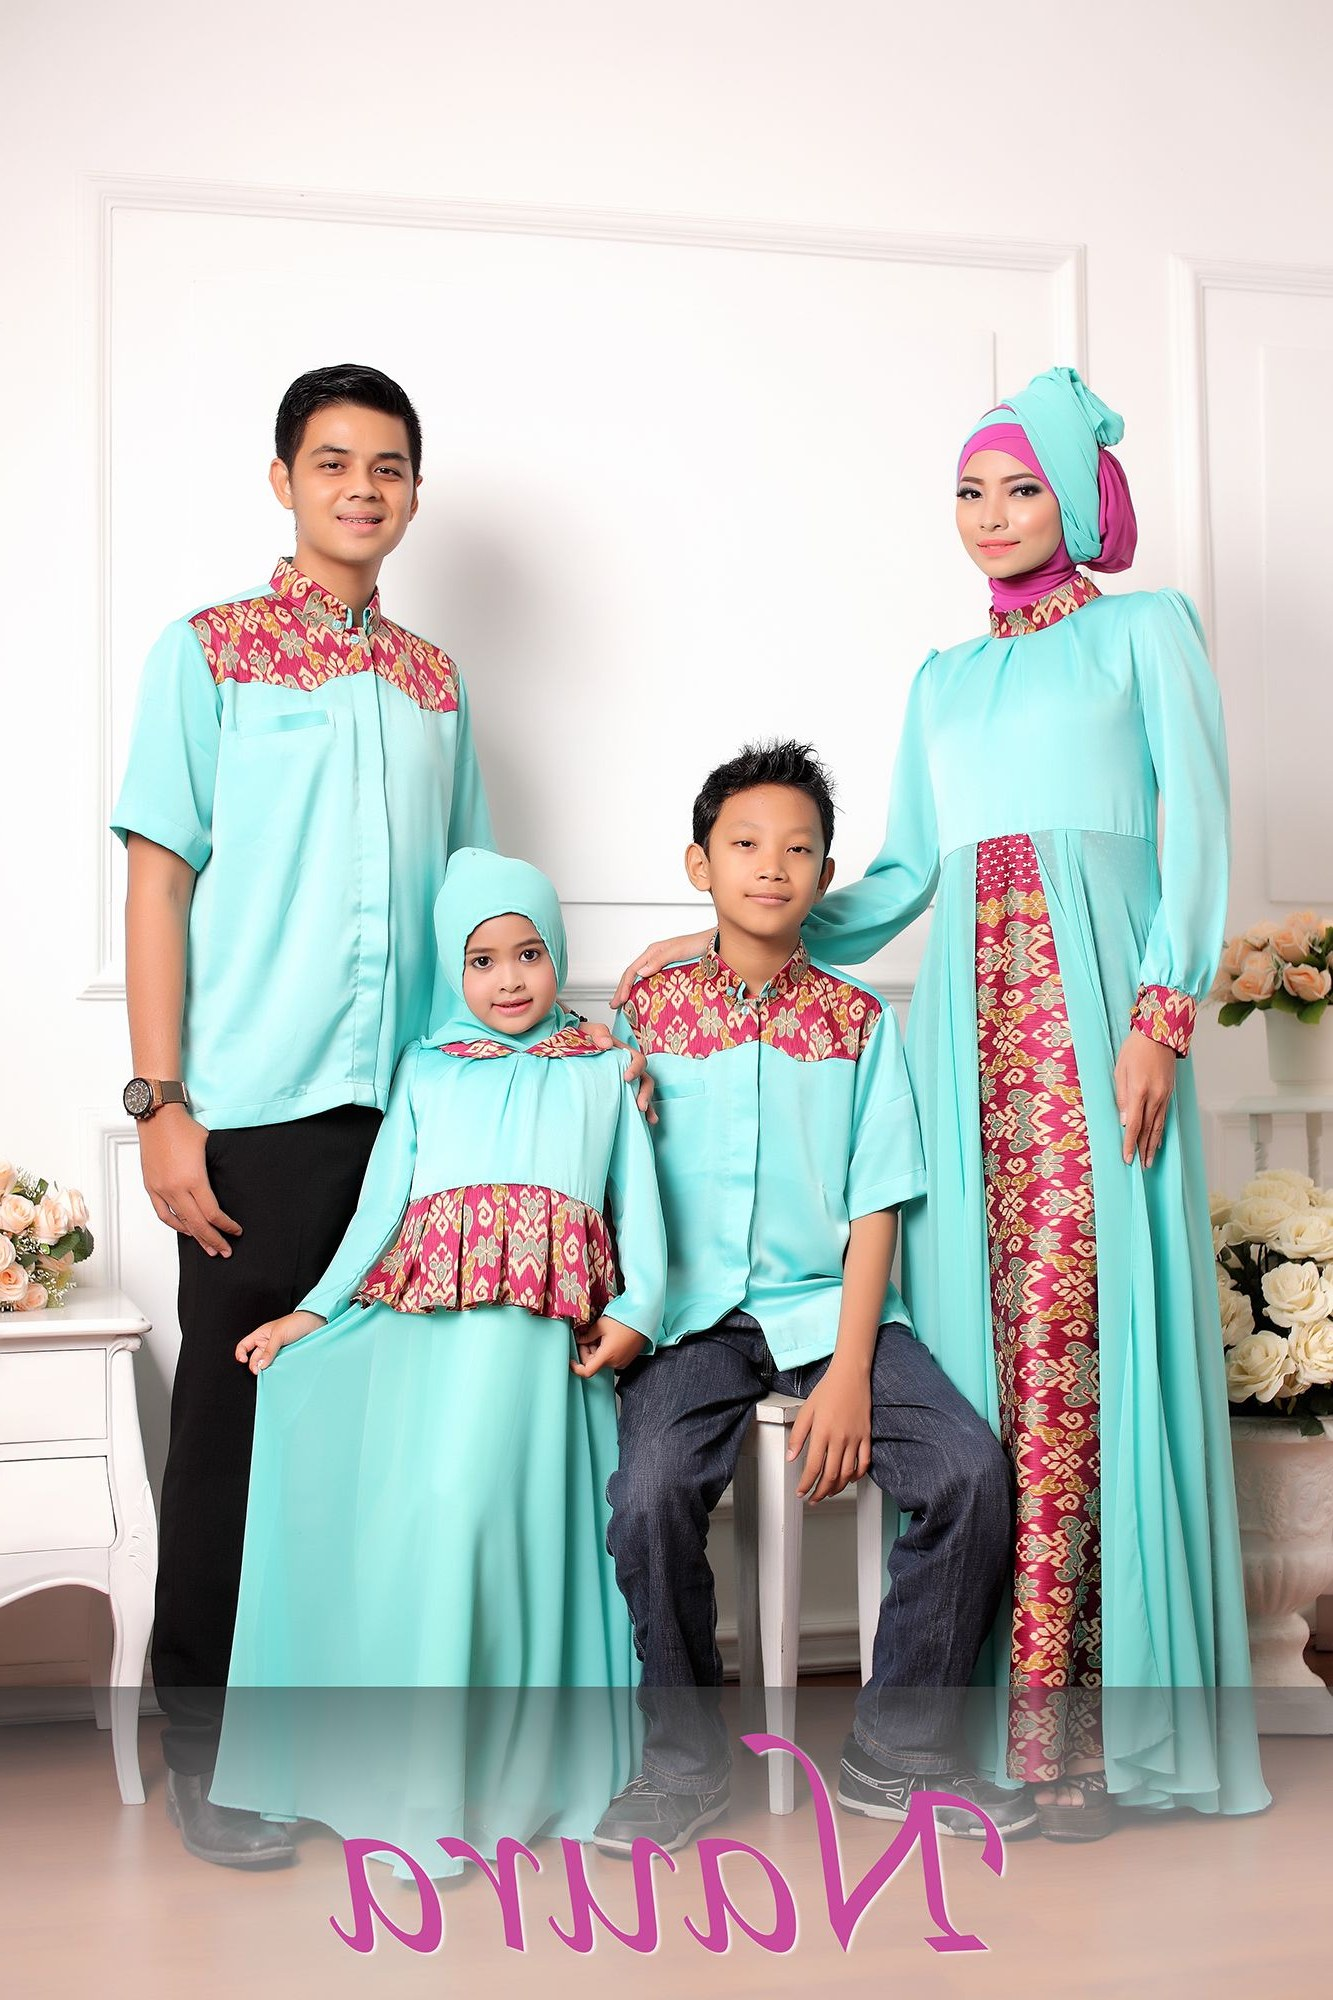 Model Inspirasi Baju Lebaran Keluarga 2019 S1du Pin Oleh Dini Tasriva Di Gamis Batik Di 2019